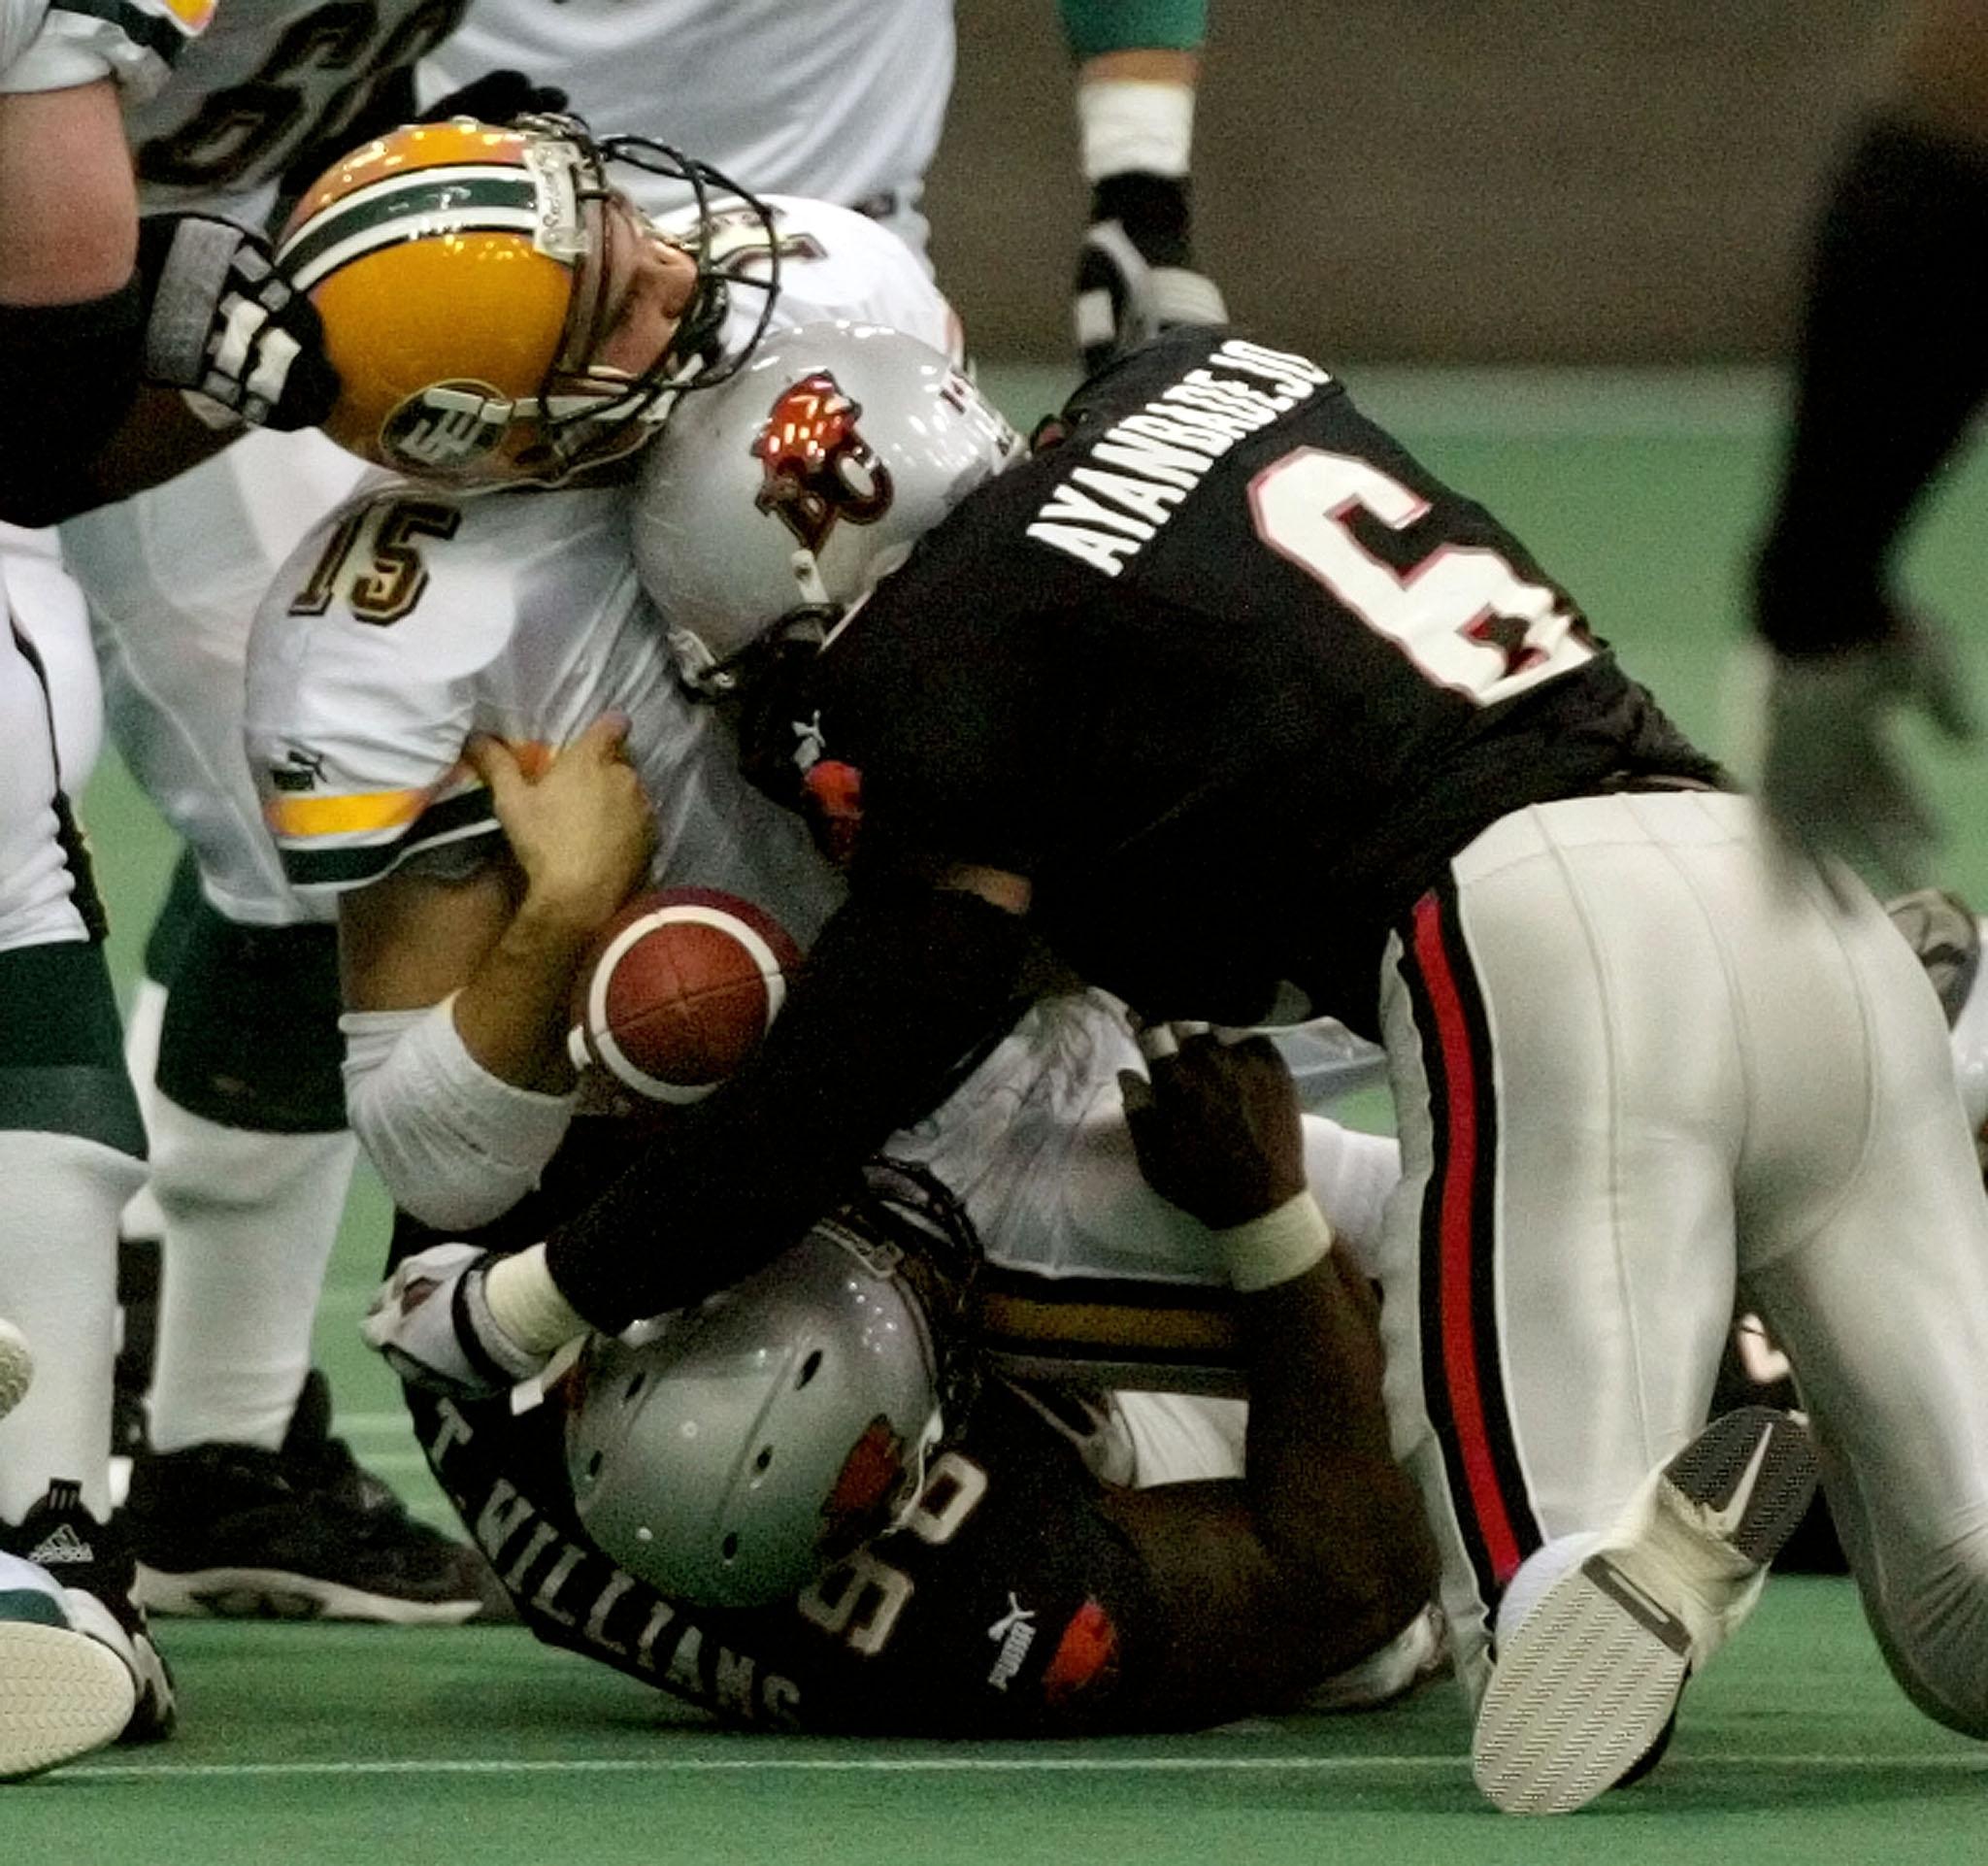 Football Head Injuries And The Ethics Of Fandom - The Atlantic regarding Employee Rotation Program Football Theme